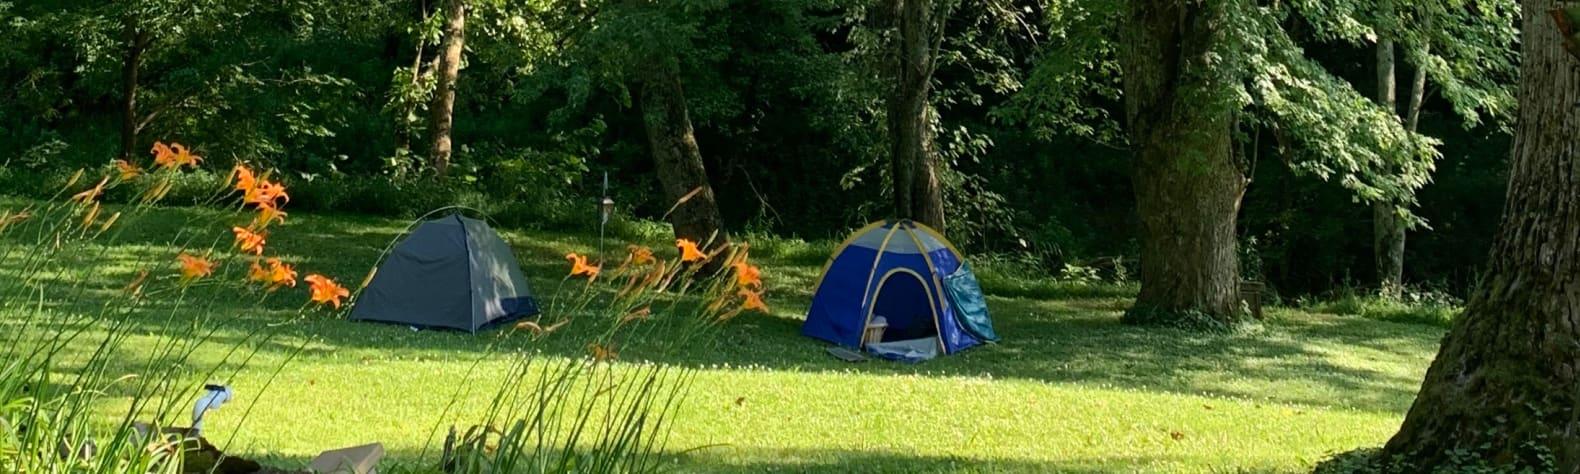 Little Blue Horse Camp